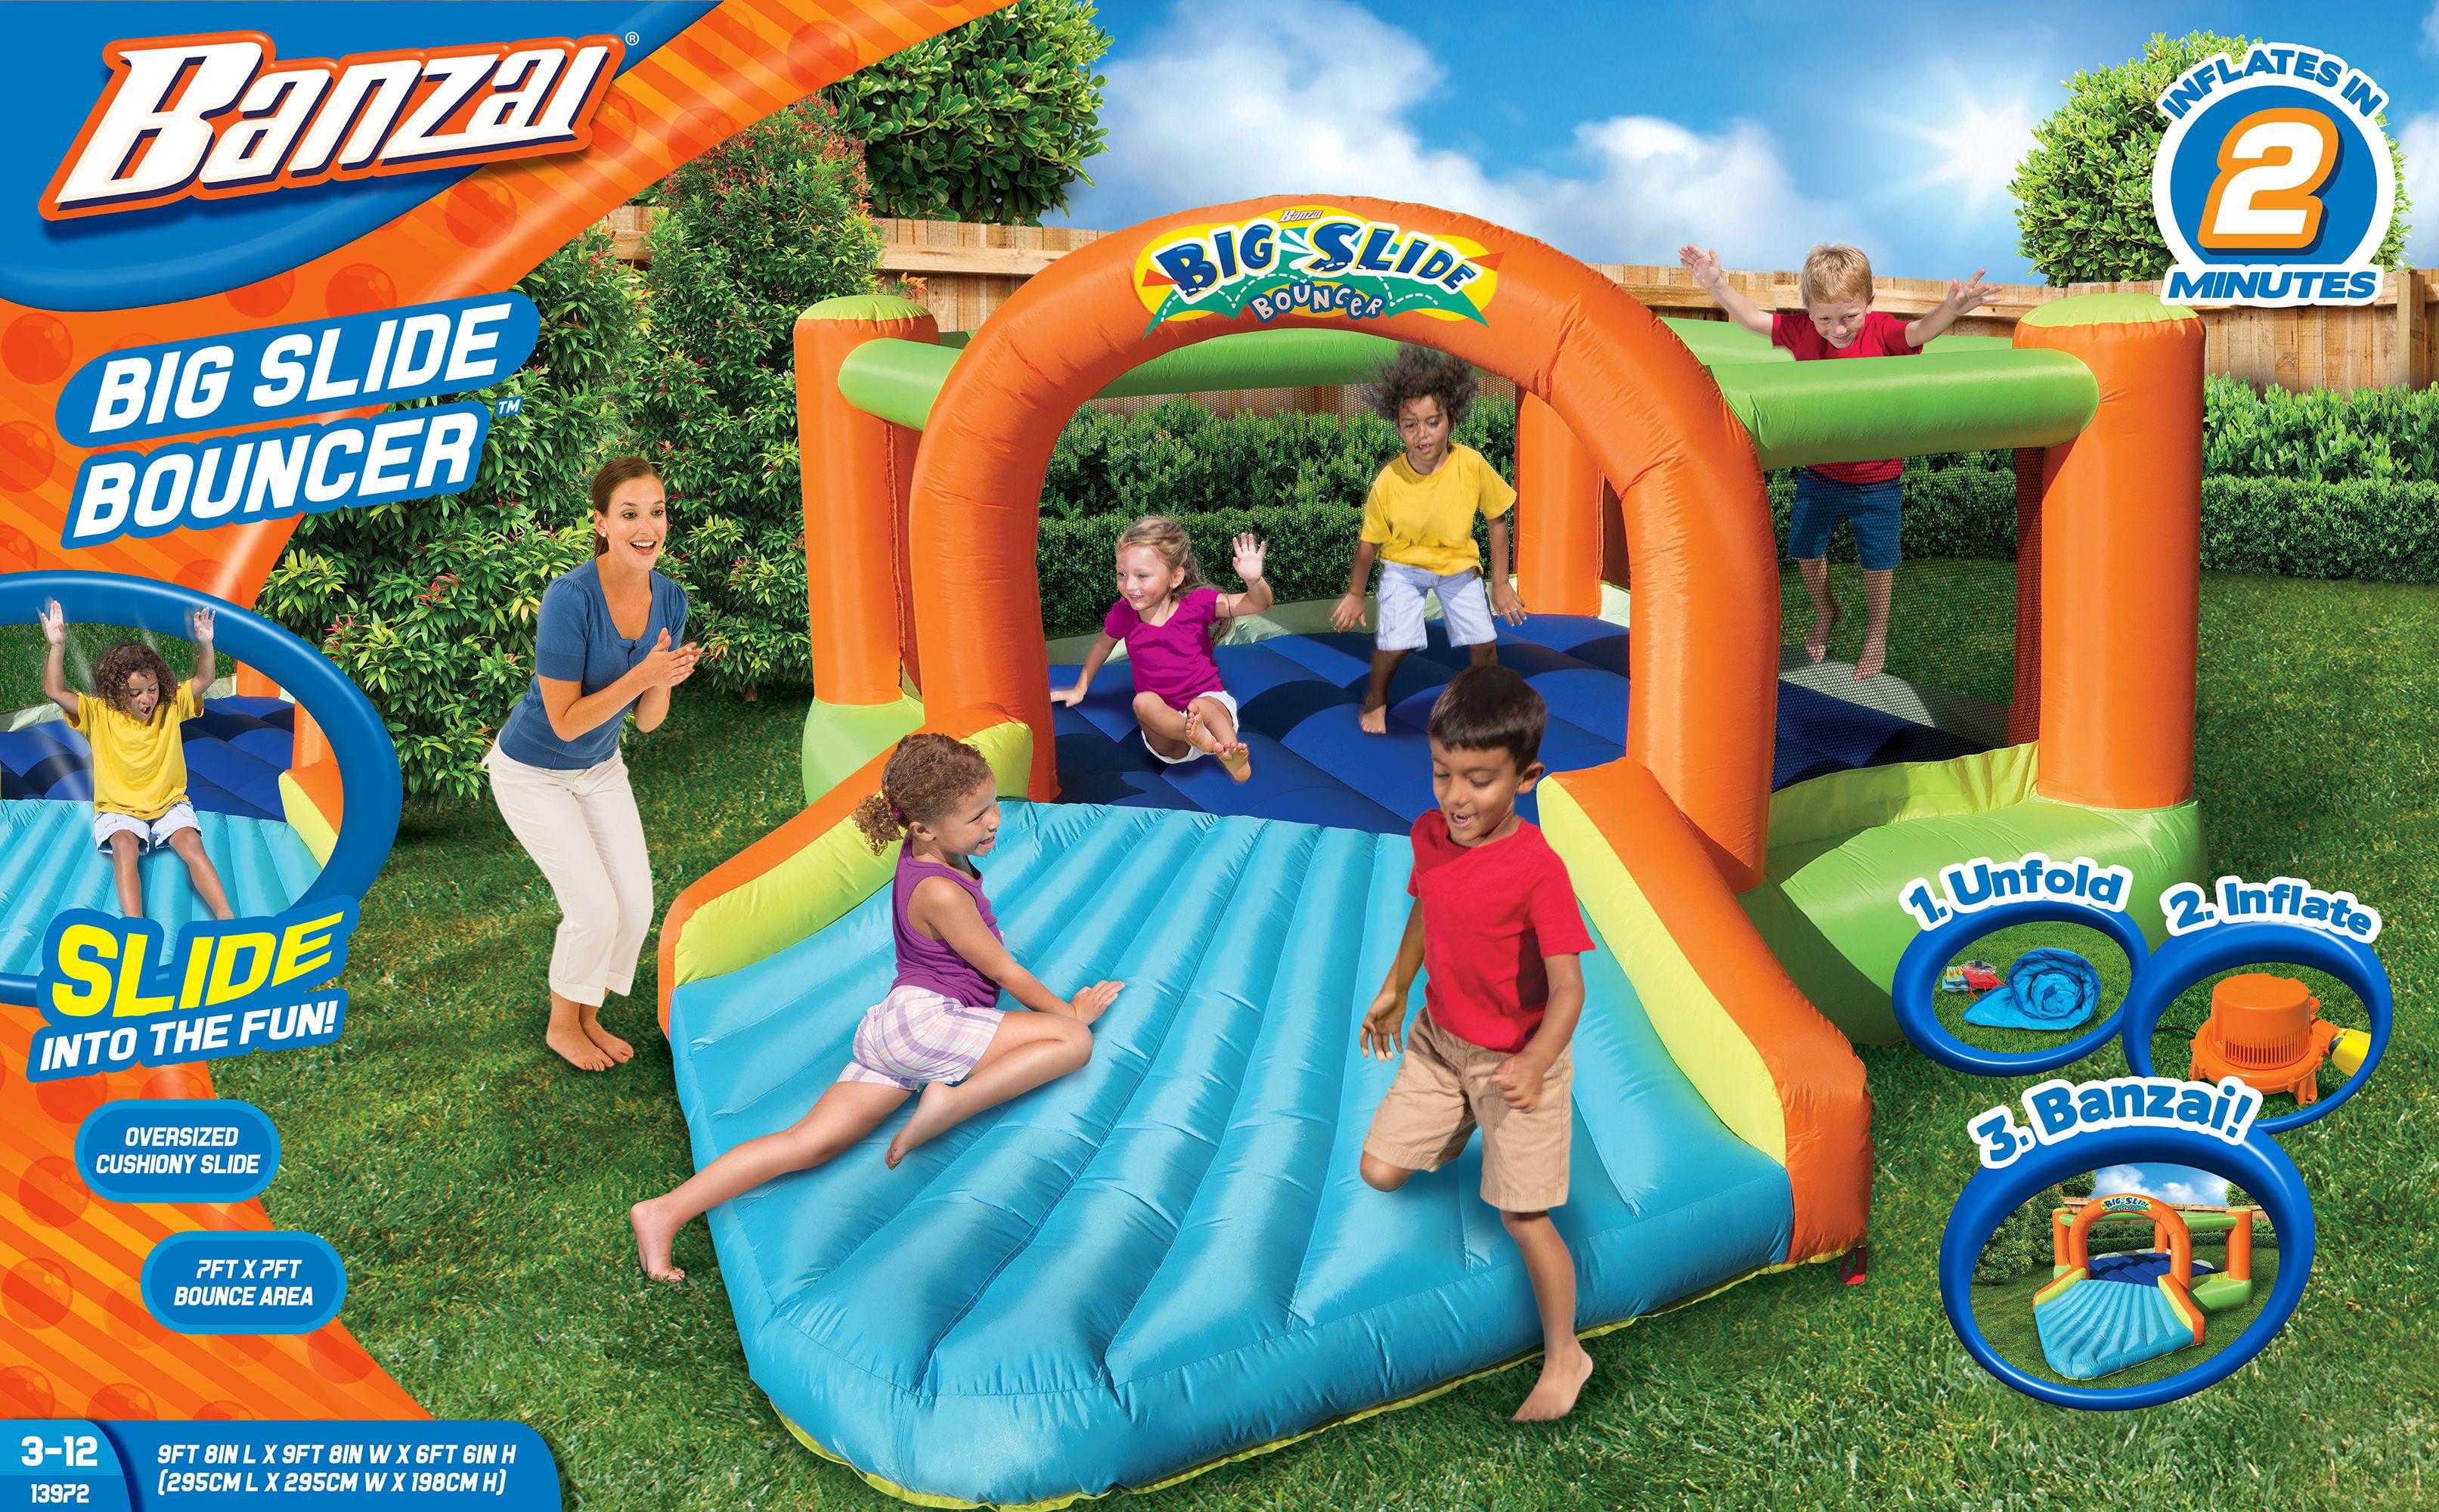 Banzai Big Slide Bouncer (Inflatable Jumping Bounce House Backyard Summer Bouncing Jump Castle) by Banzai